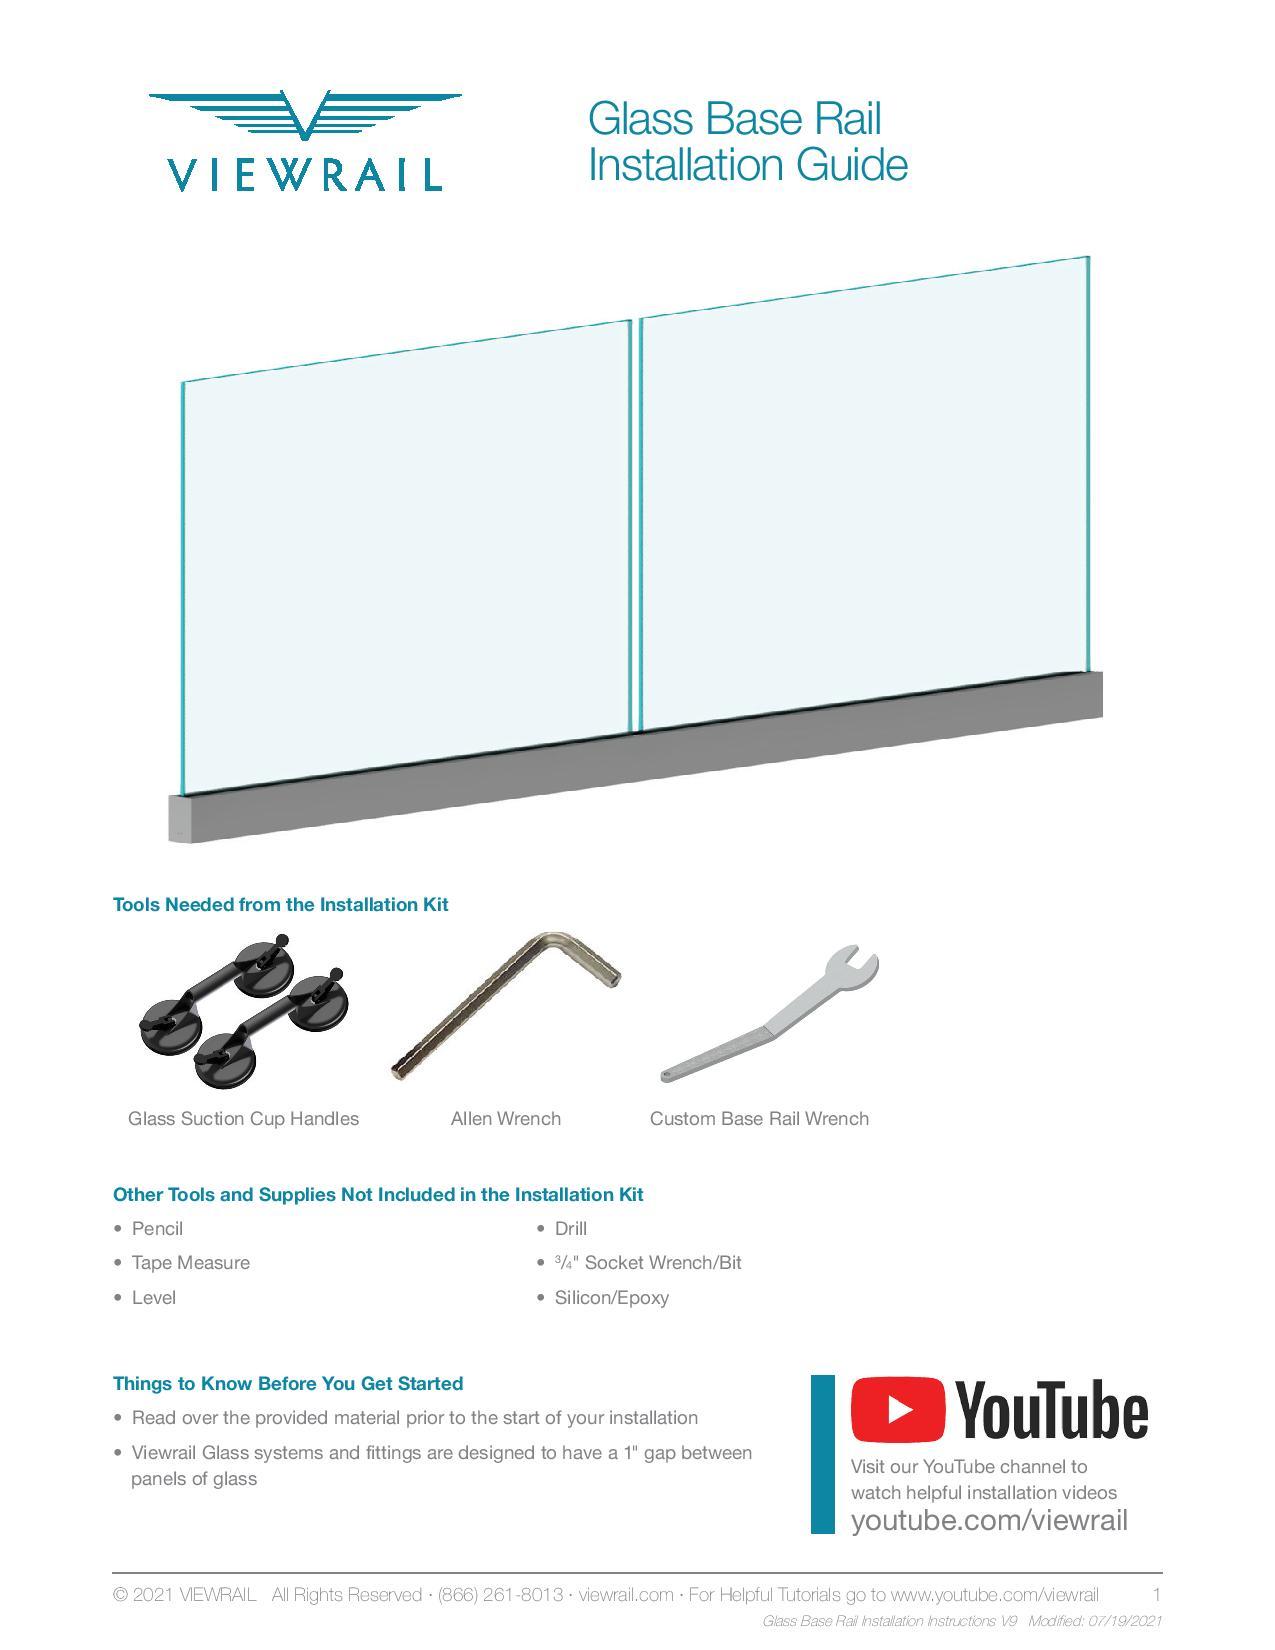 Glass Base Rail Installation Instructions V9 (1)-page-001